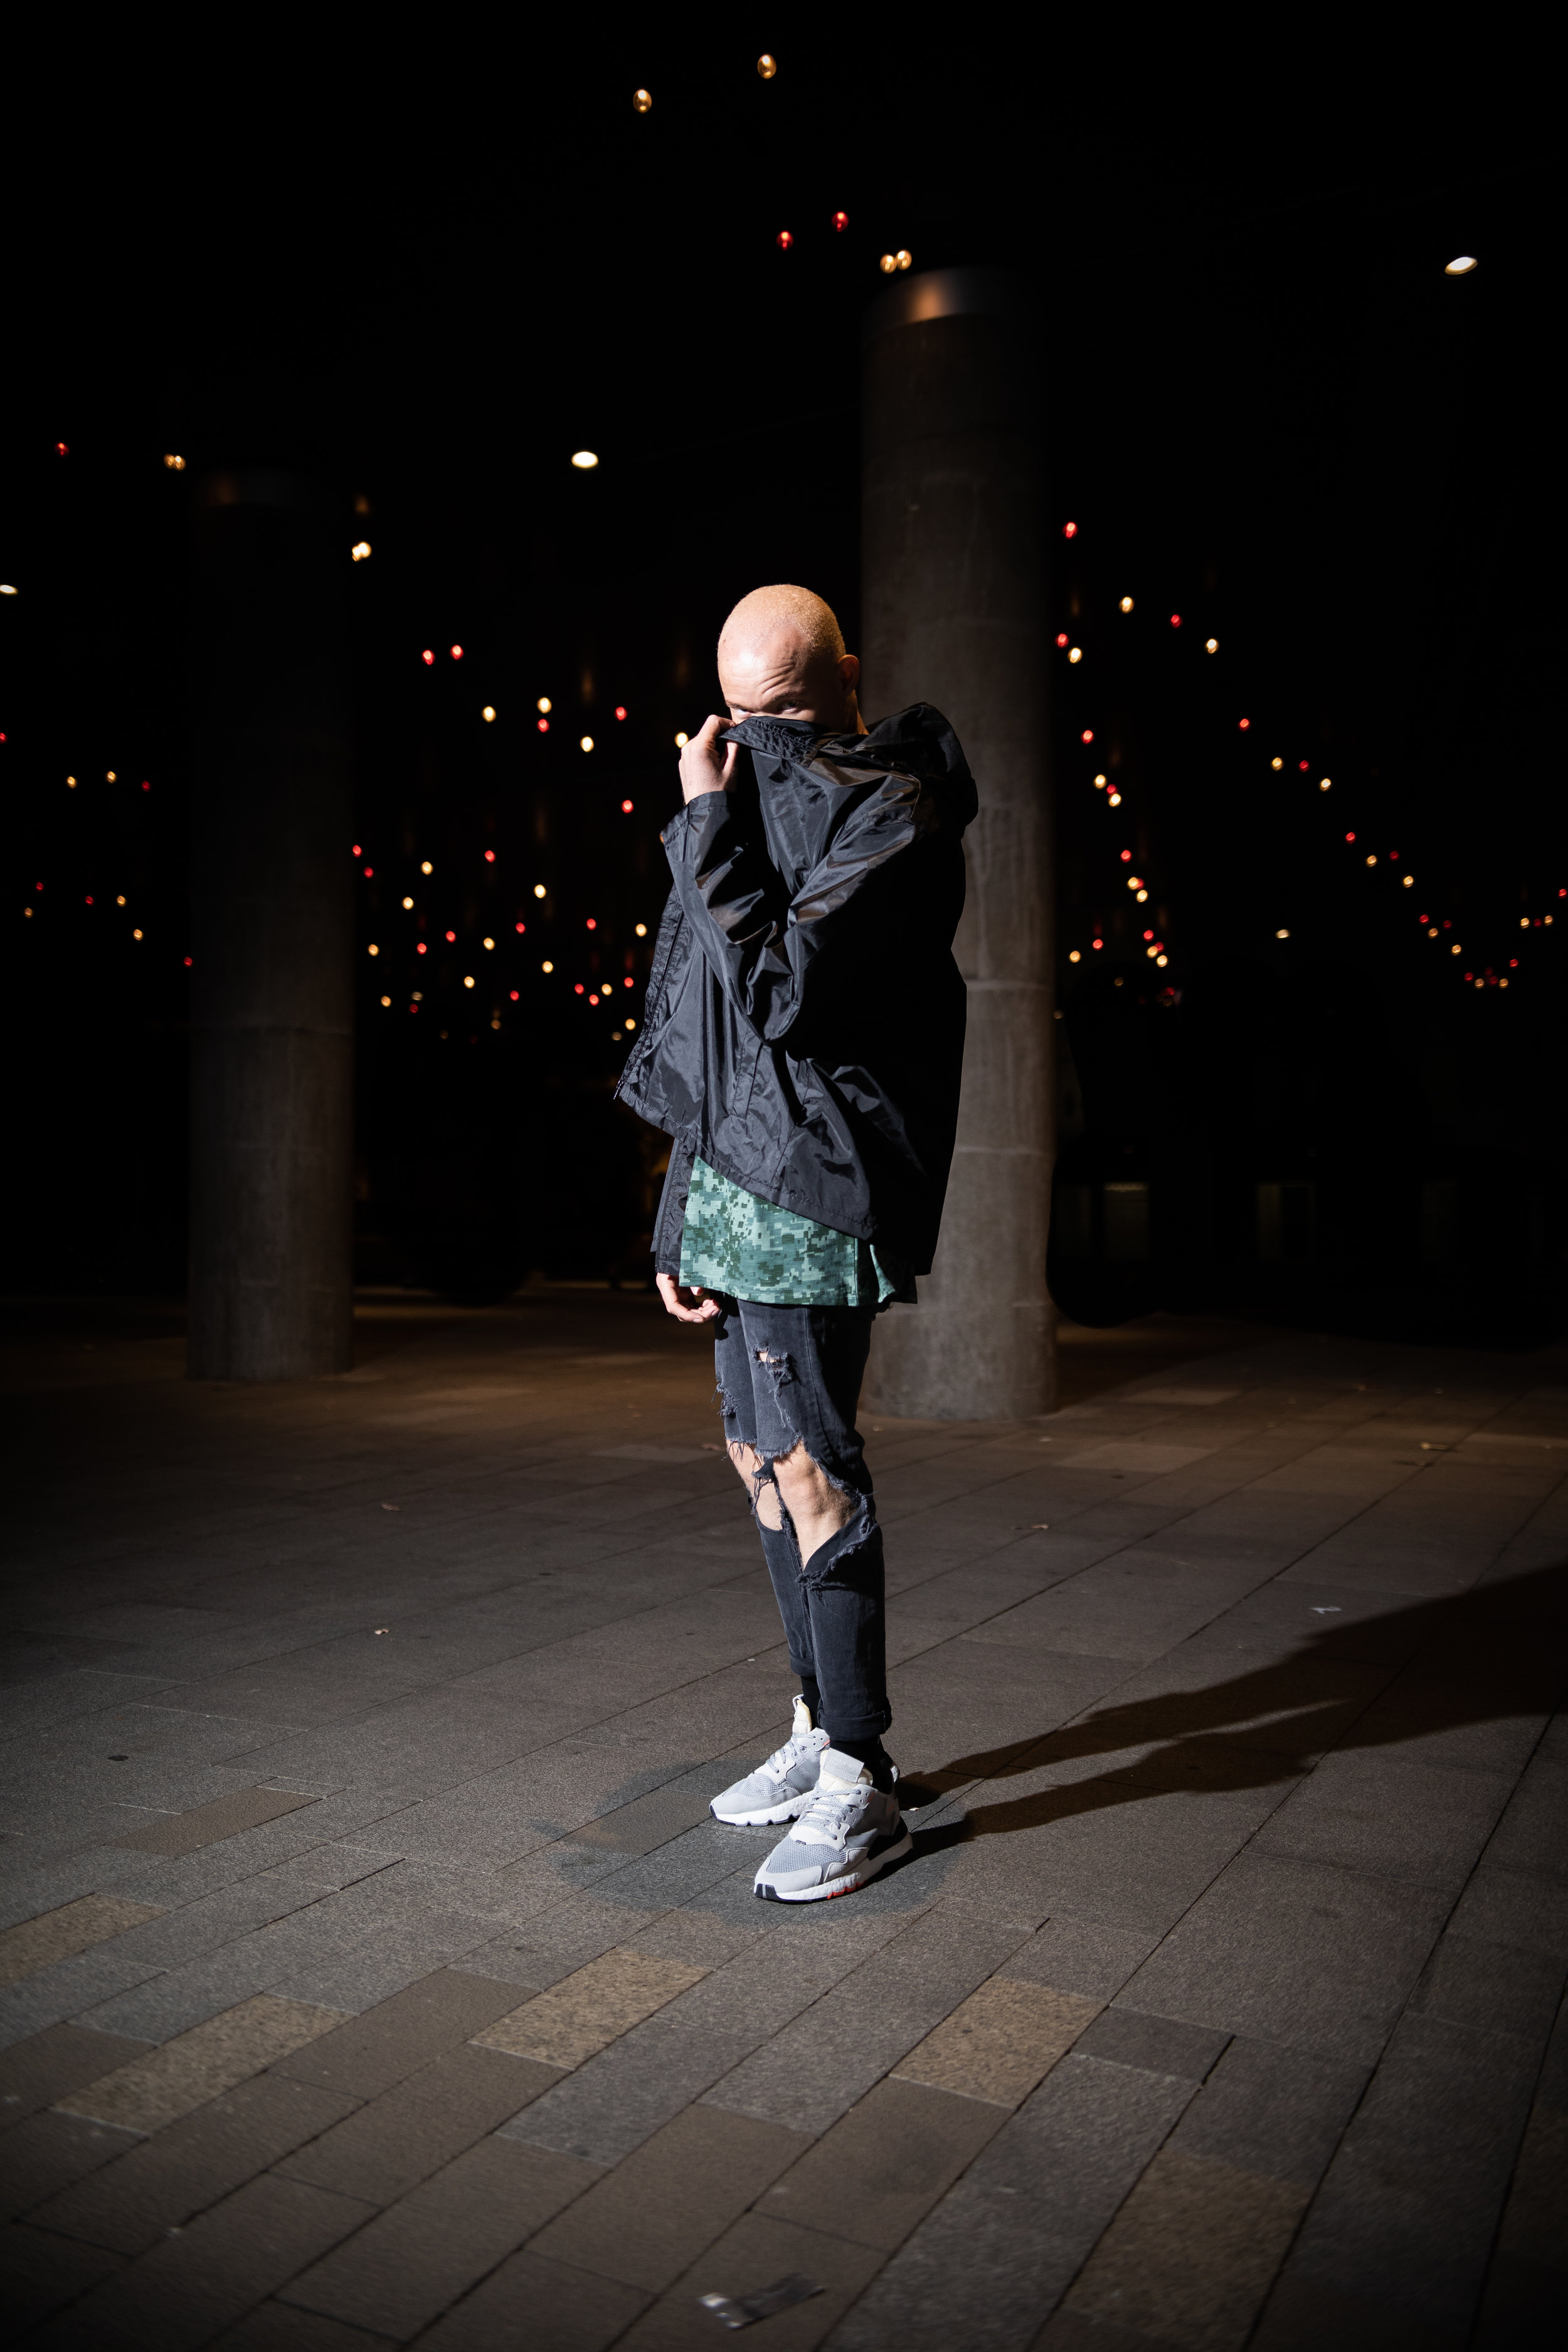 BRI19H-Adidas_Stills_Weah_Night_16.jpg